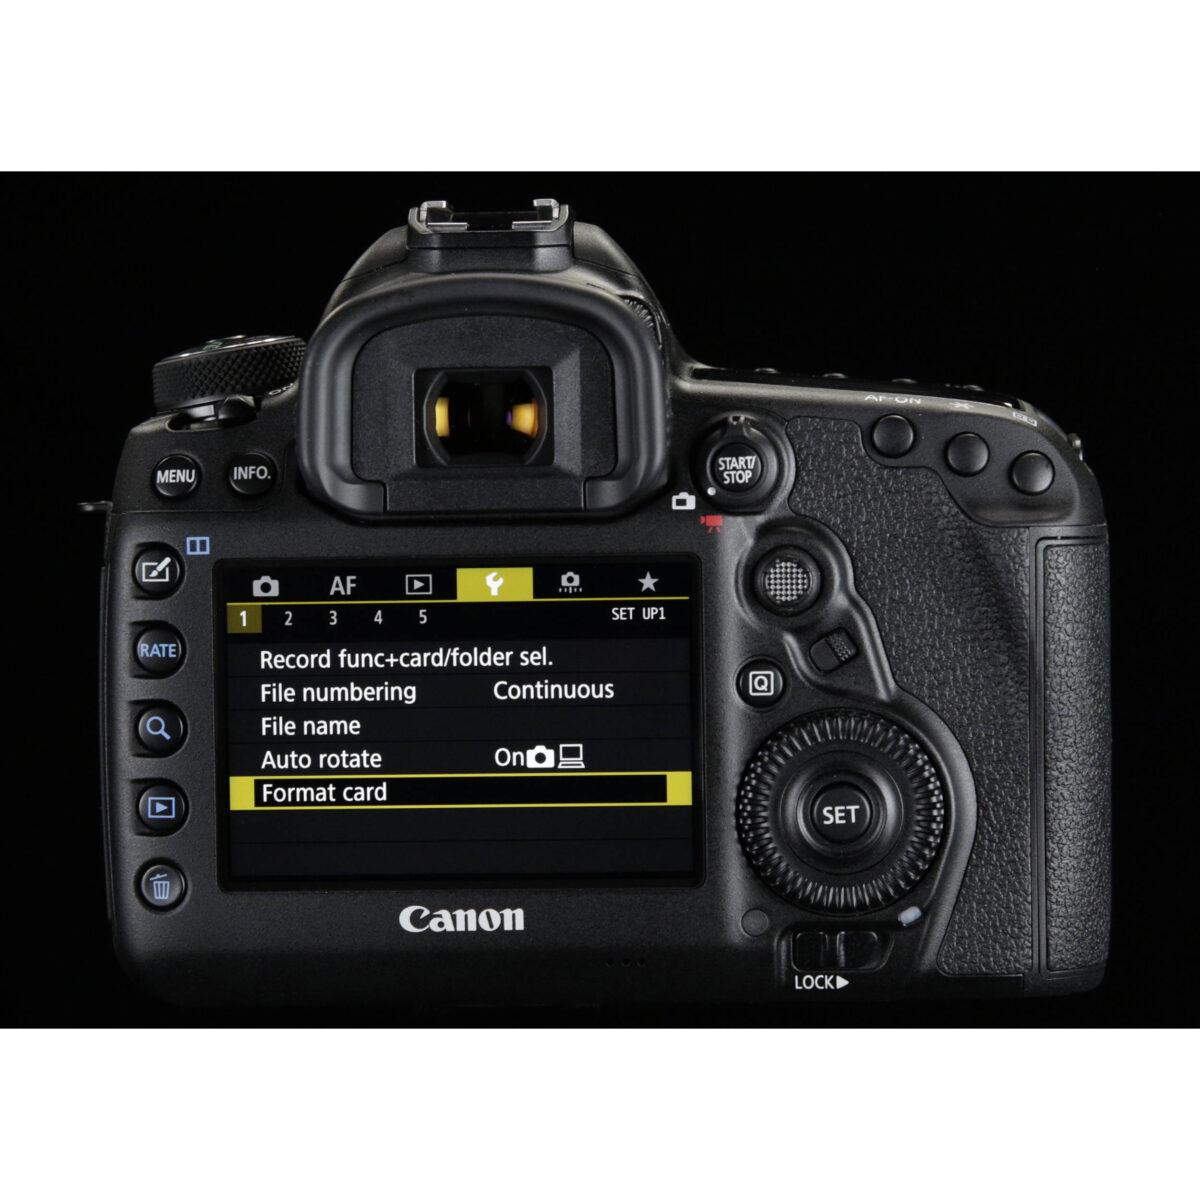 سفارش آنلاین دوربین canon eos 5d mark IV تایپ 2 - یزد کمرا